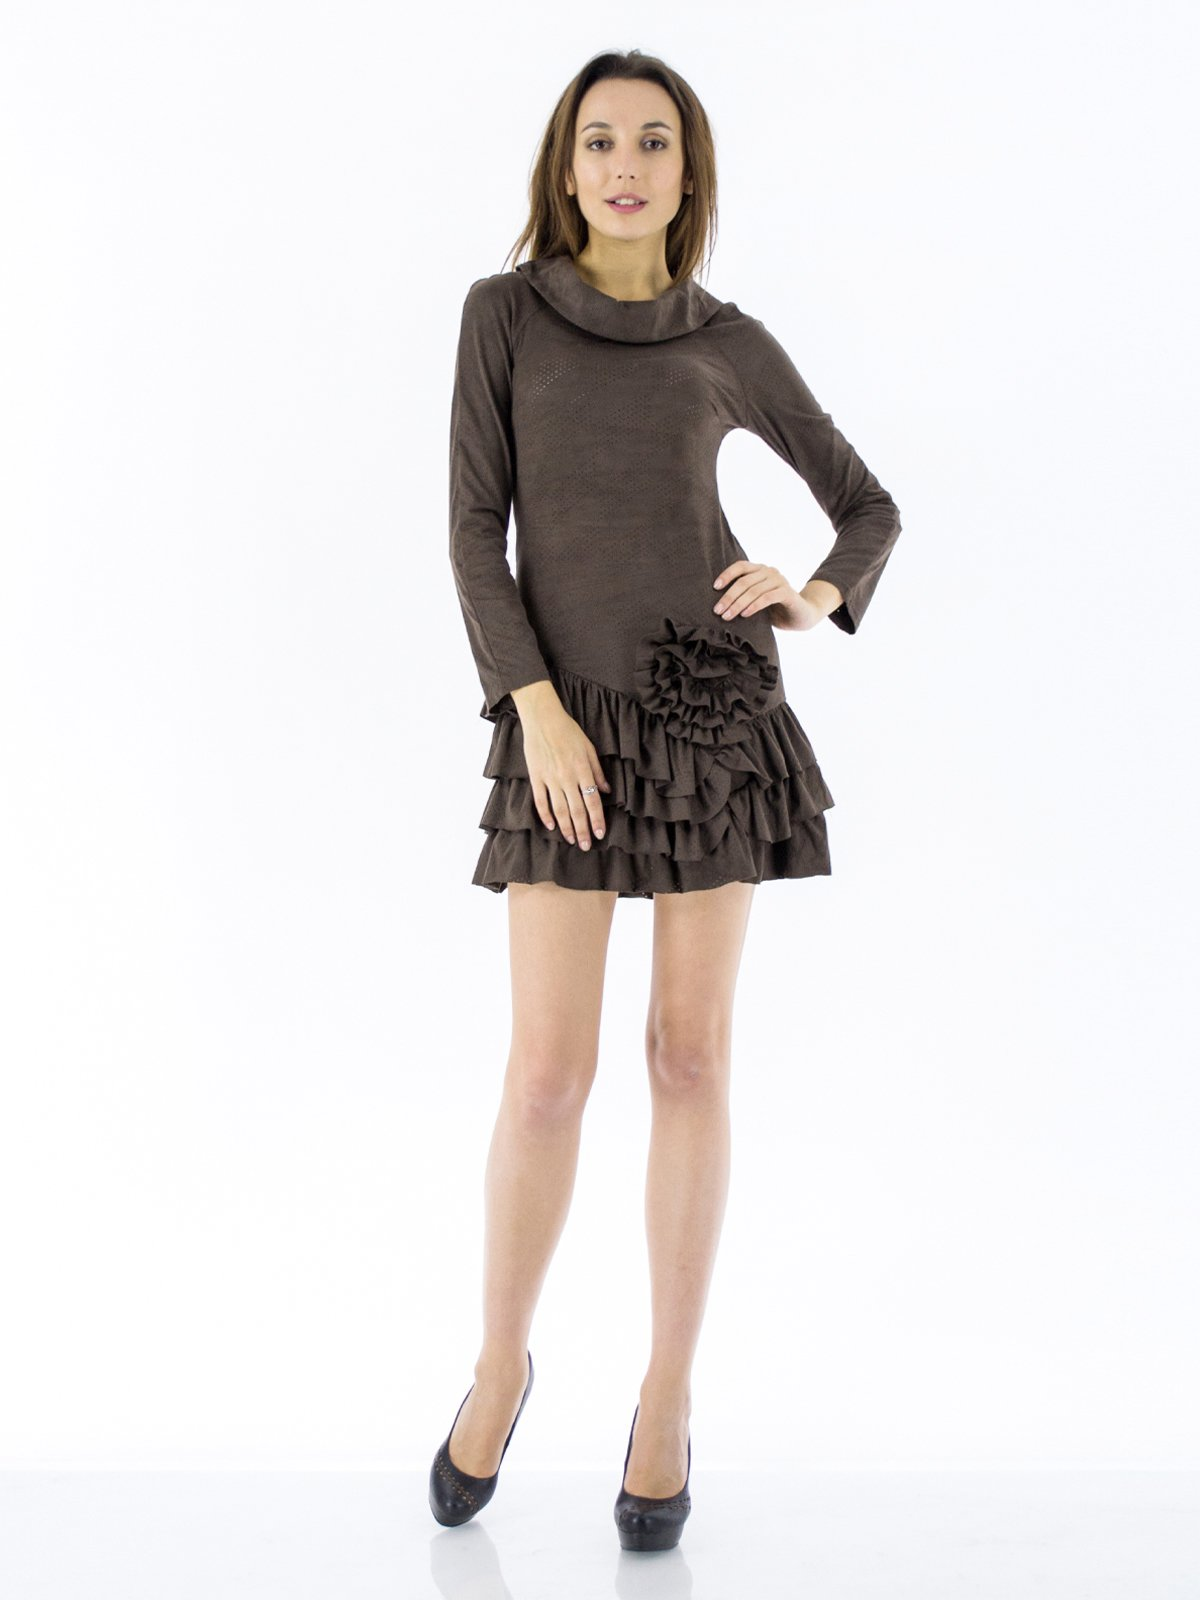 Платье коричневое   155232